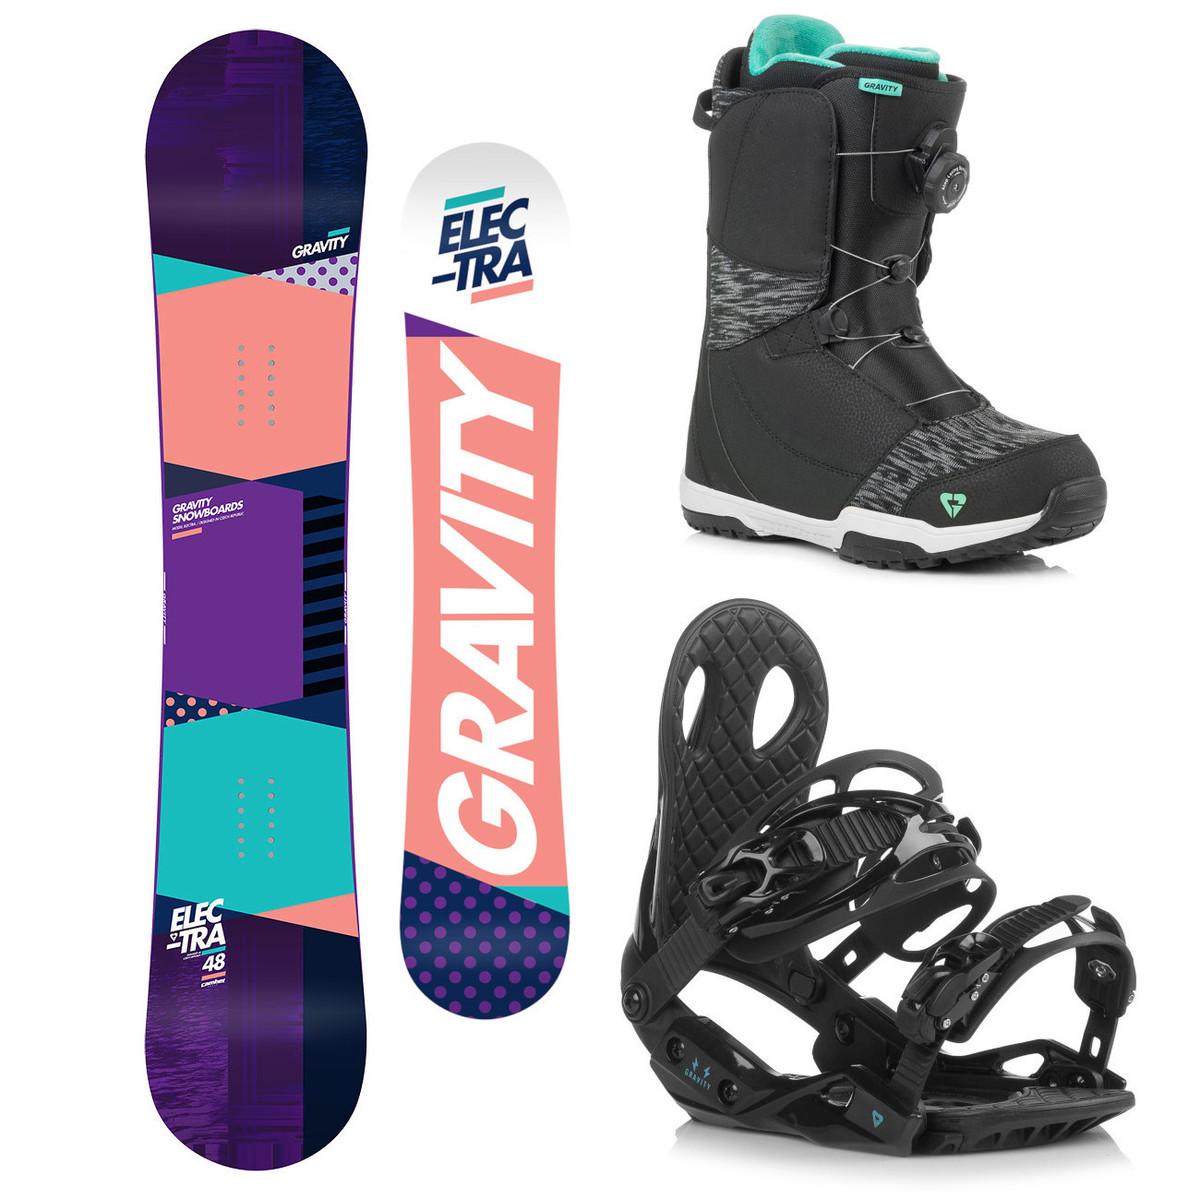 Snowboardový komplet Gravity Electra 18/19 M (EU 37-42) 148 Černá